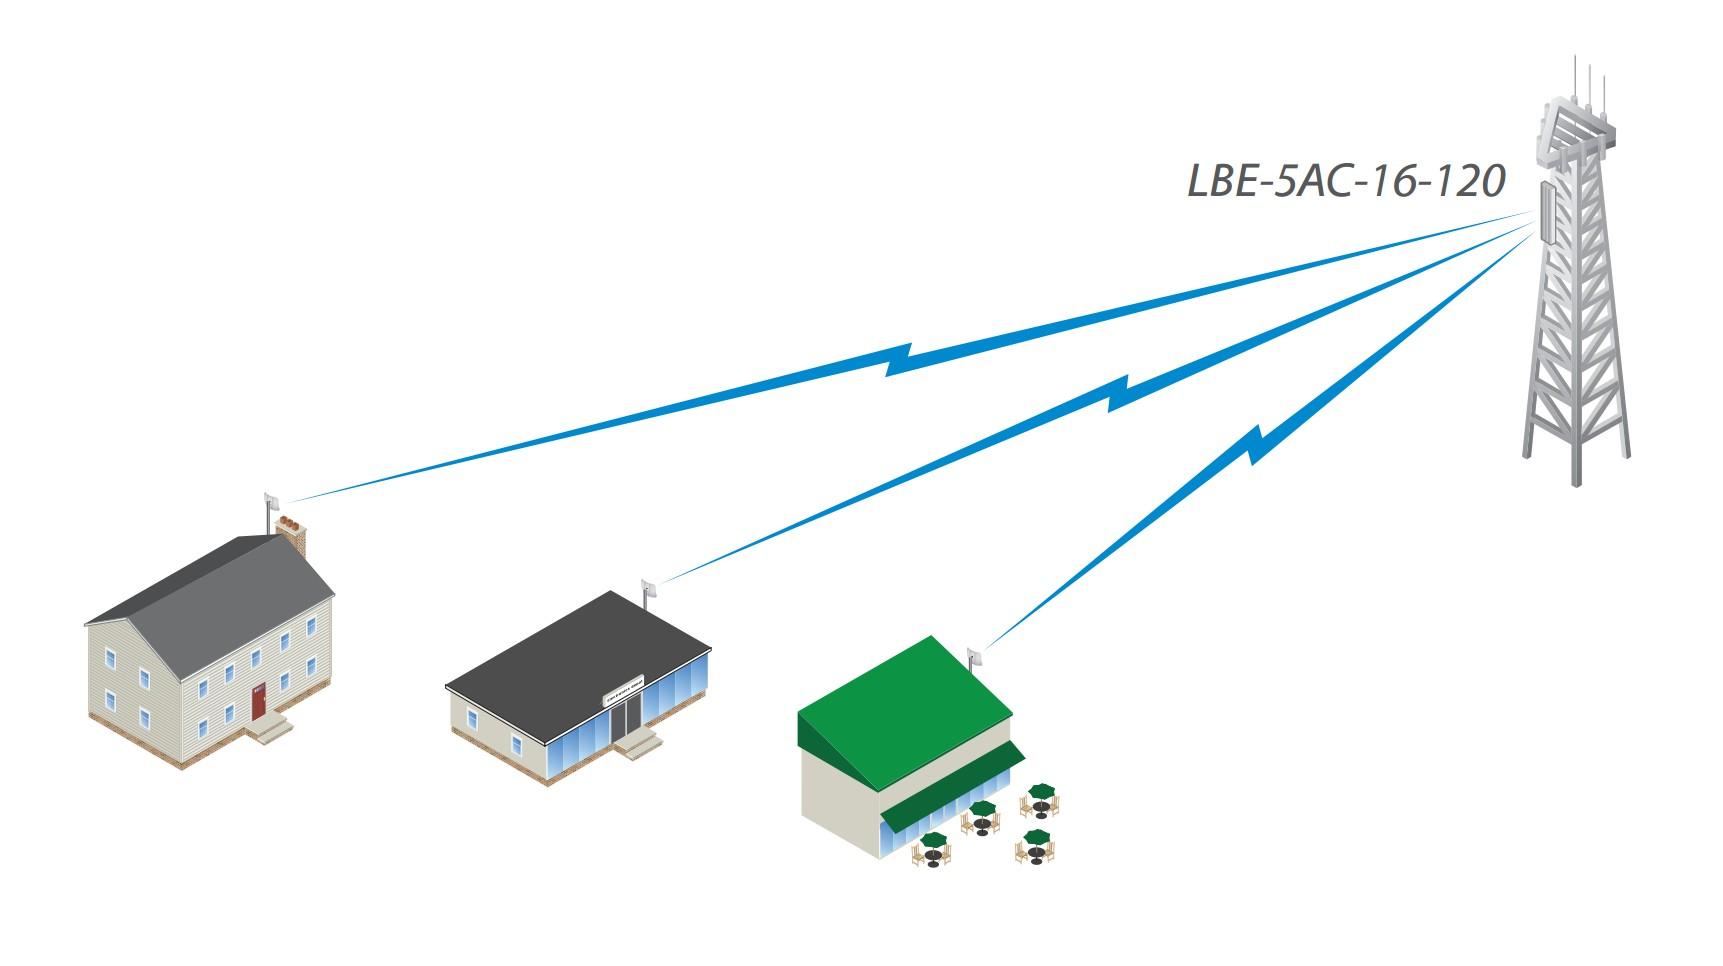 LBE-5AC-16-120 2